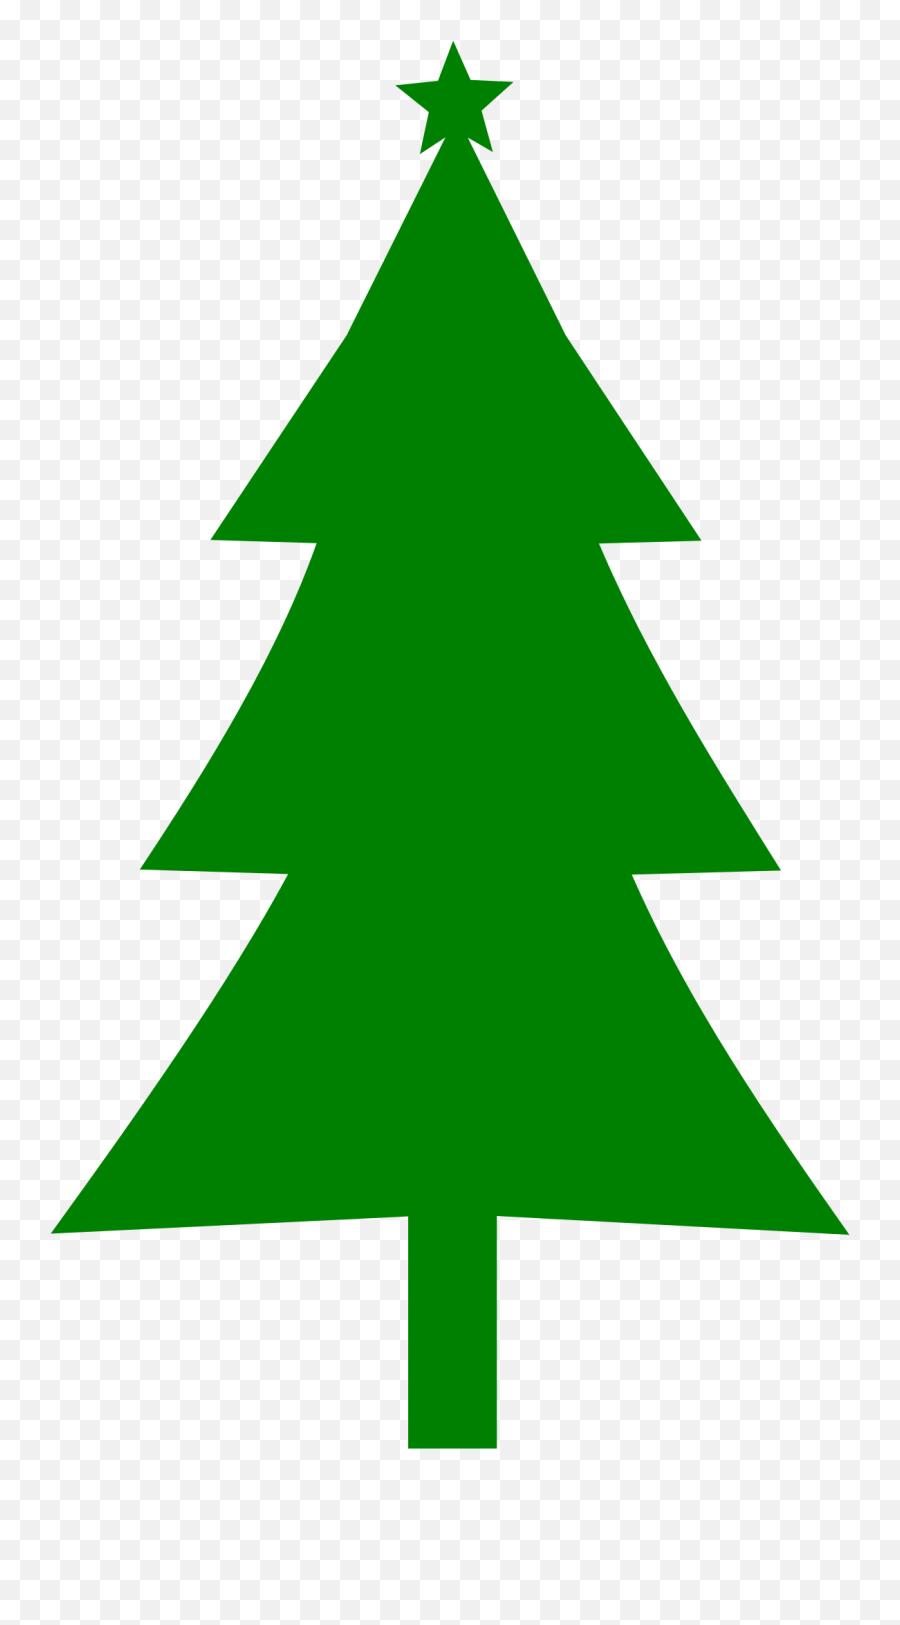 Japanese Clipart Christmas Japanese - Silhouette Christmas Tree Clipart Emoji,Christmas Tree Emoticon